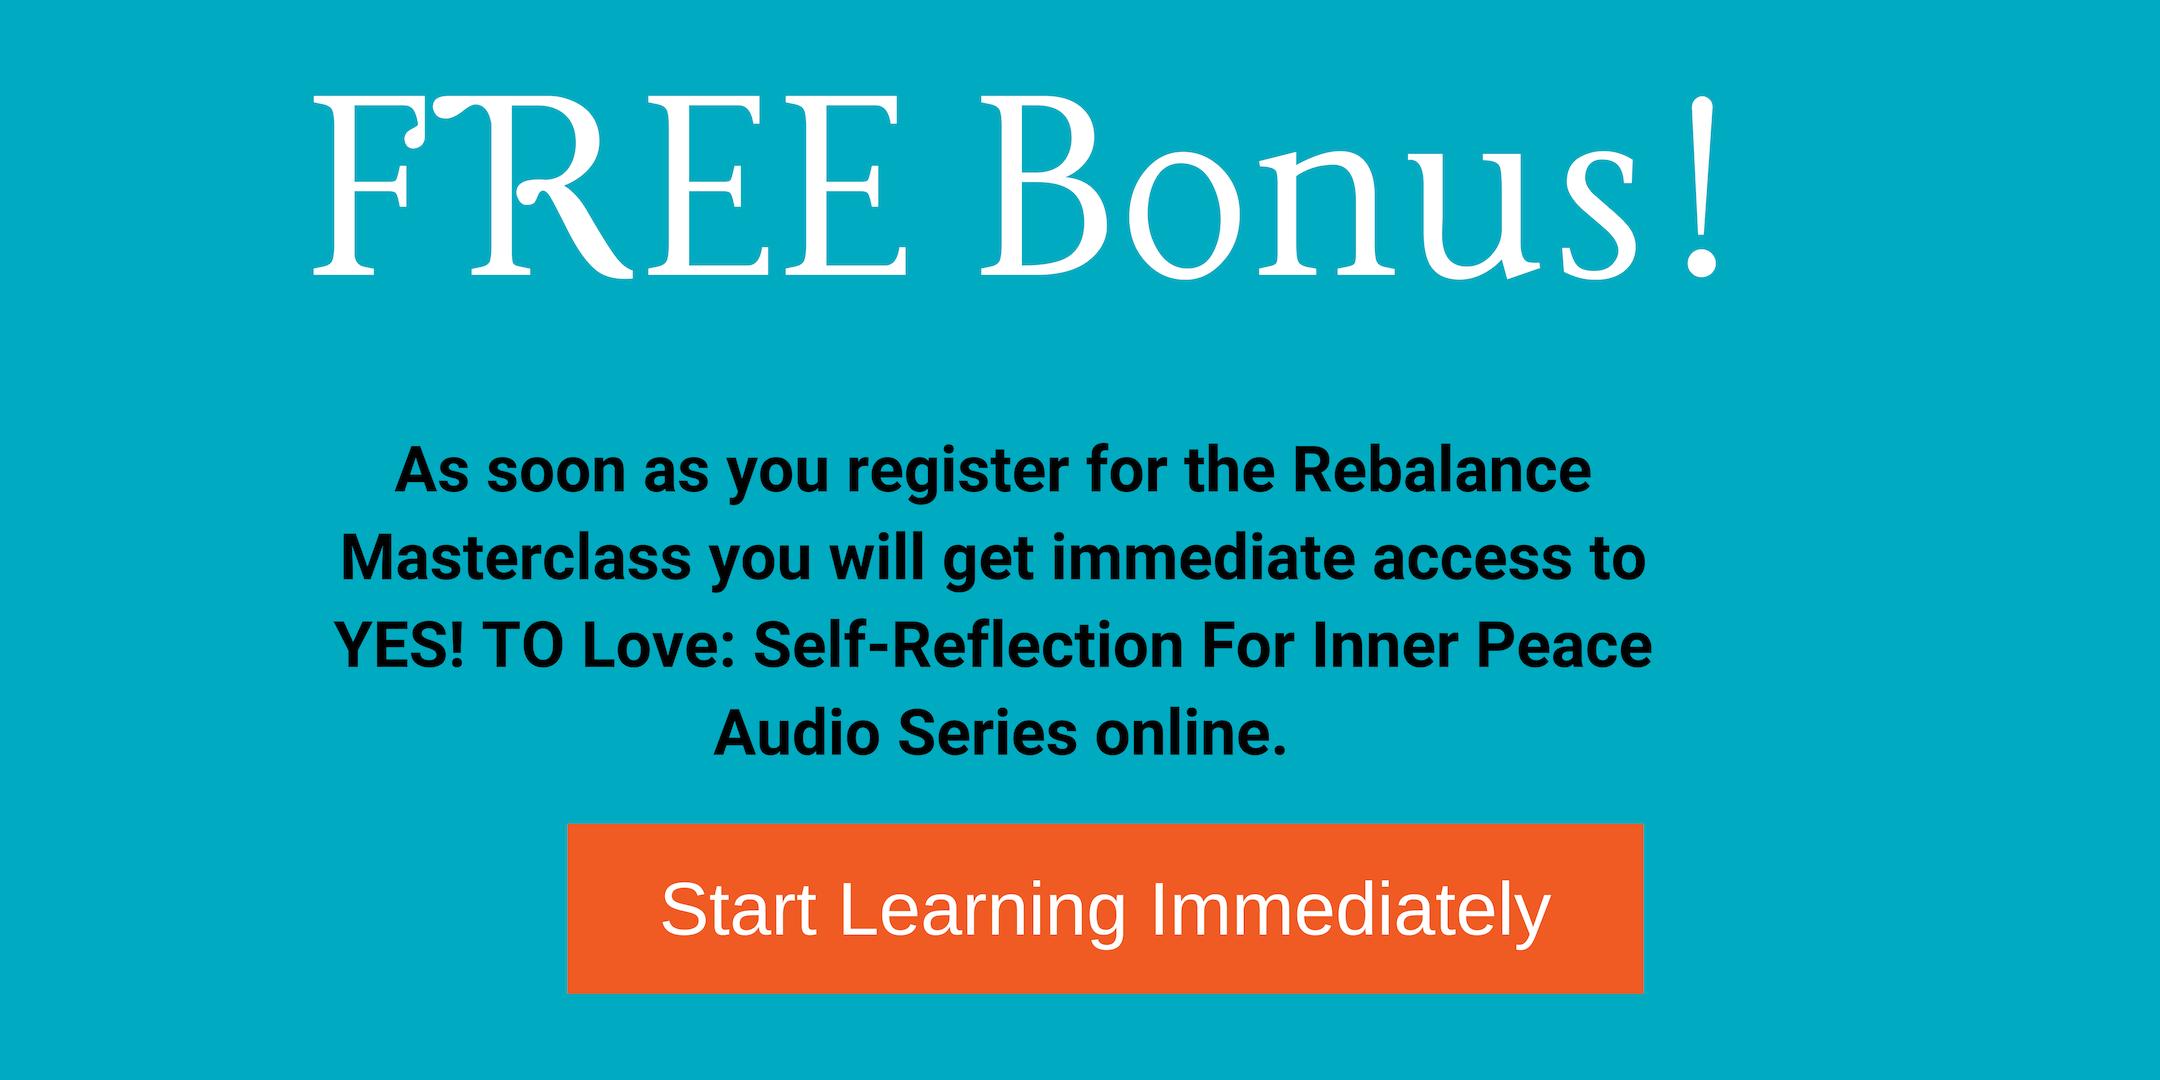 Rebalance Masterclass FREE Bonus